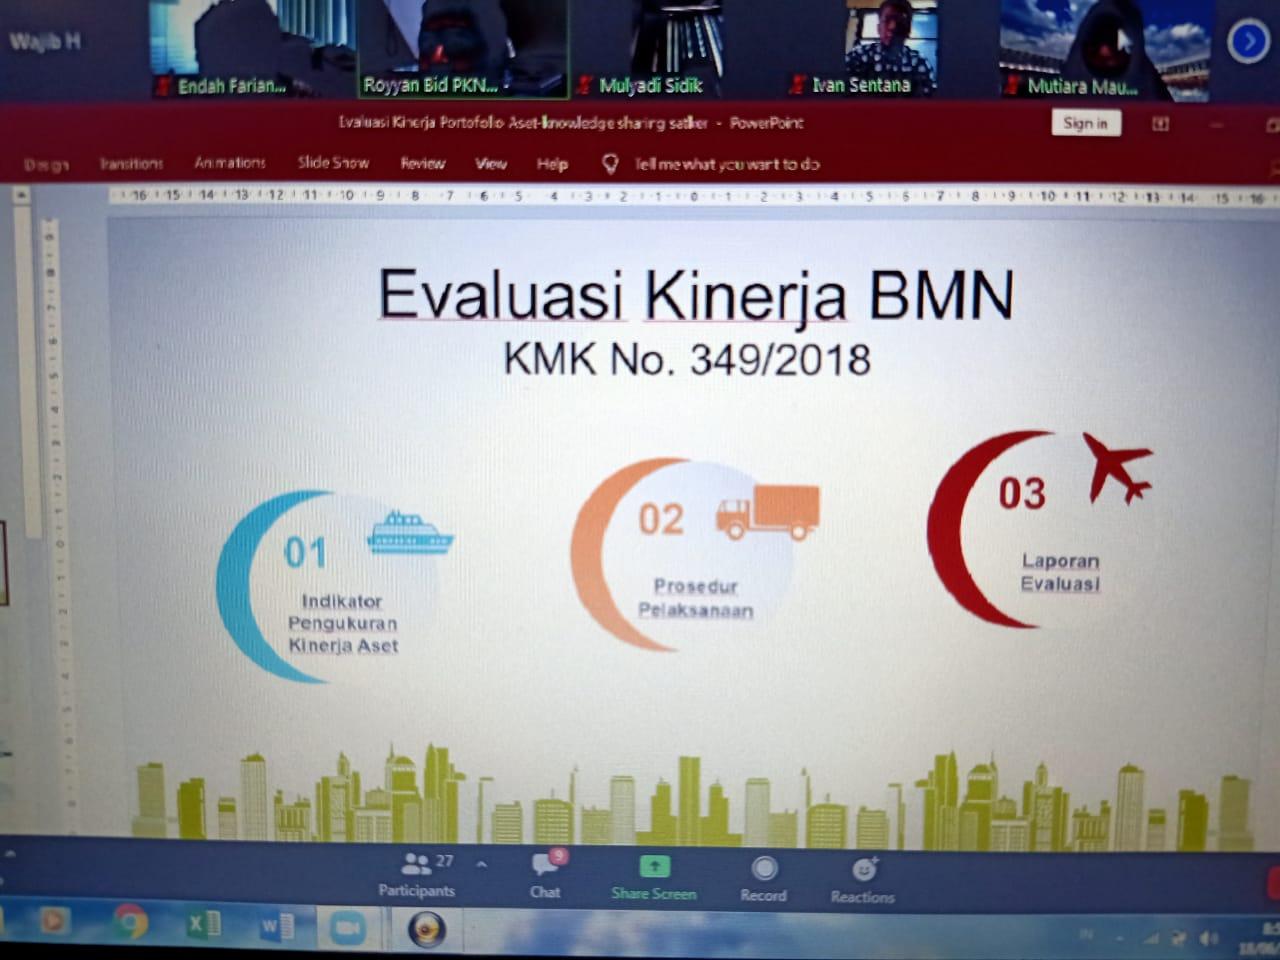 Kejar Target Pengelolaan kekayaan Negara, KPKNL Jakarta III Adakan Sosialisasi Evaluasi Kinerja Portofolio Aset Bersama Satker